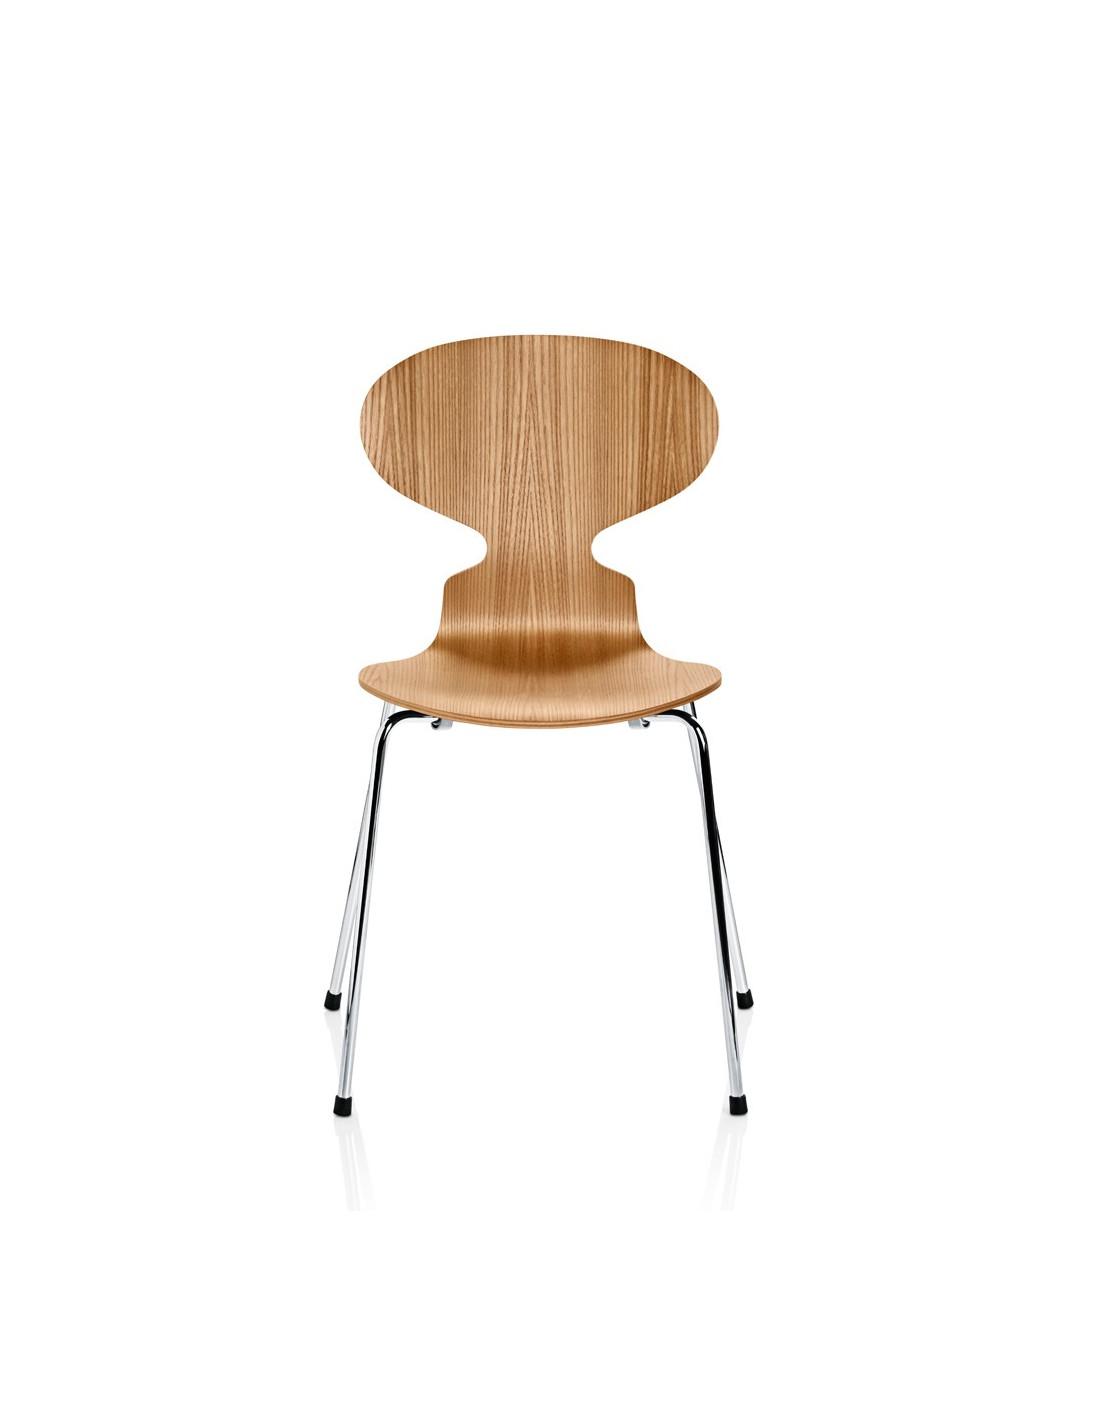 Chaise fourmi design arne jacobsen pour fritz hansen la for Chaise fourmi jacobsen